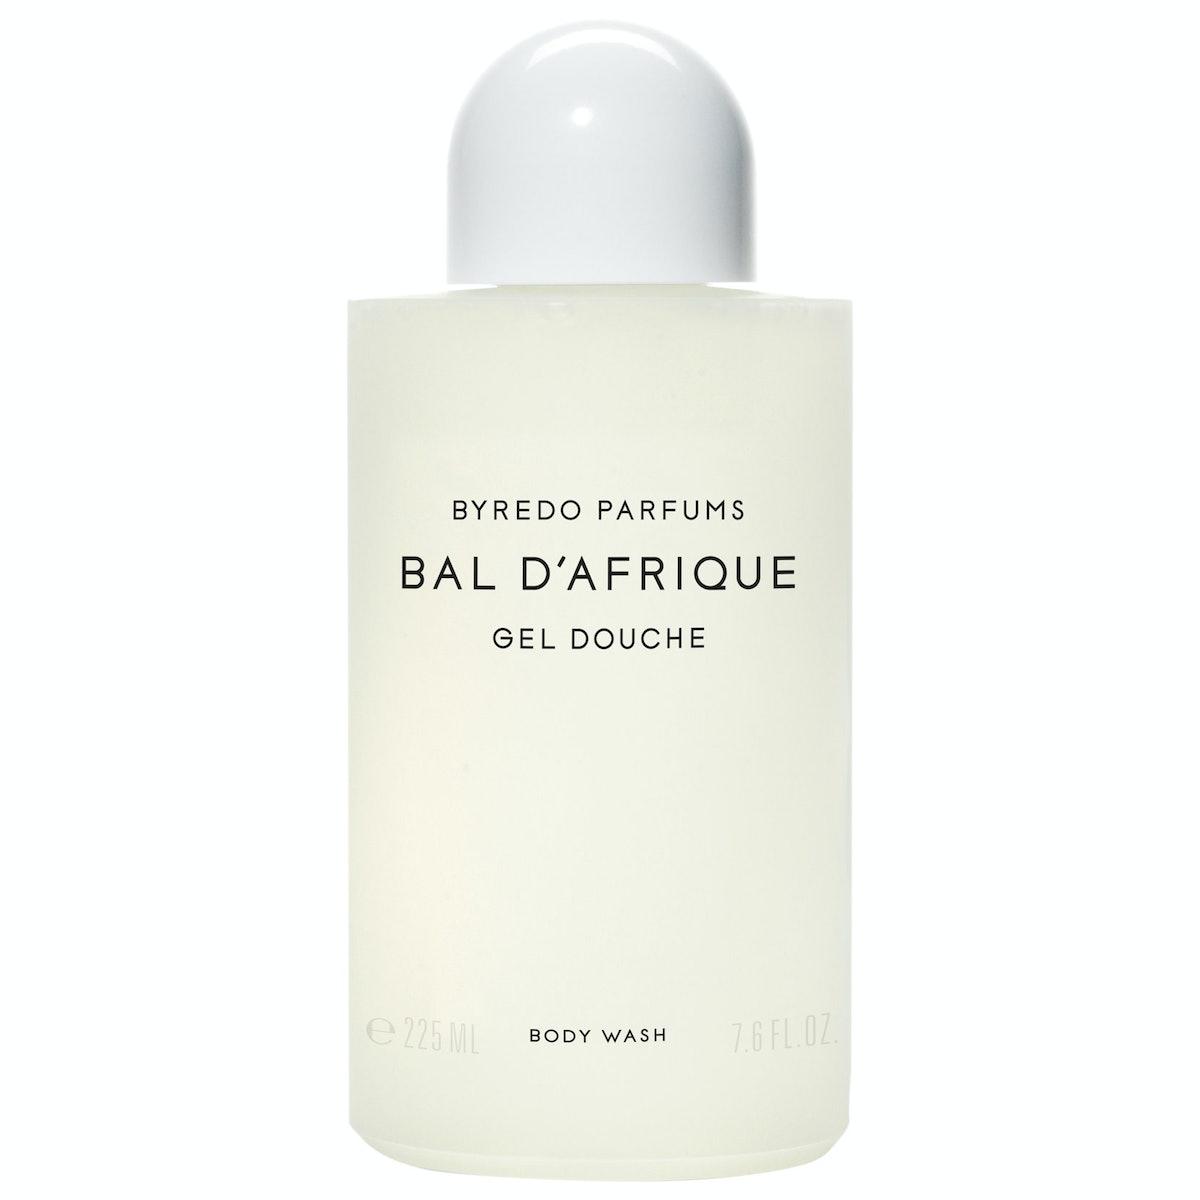 Byredo Bal D'Afrique Body Wash